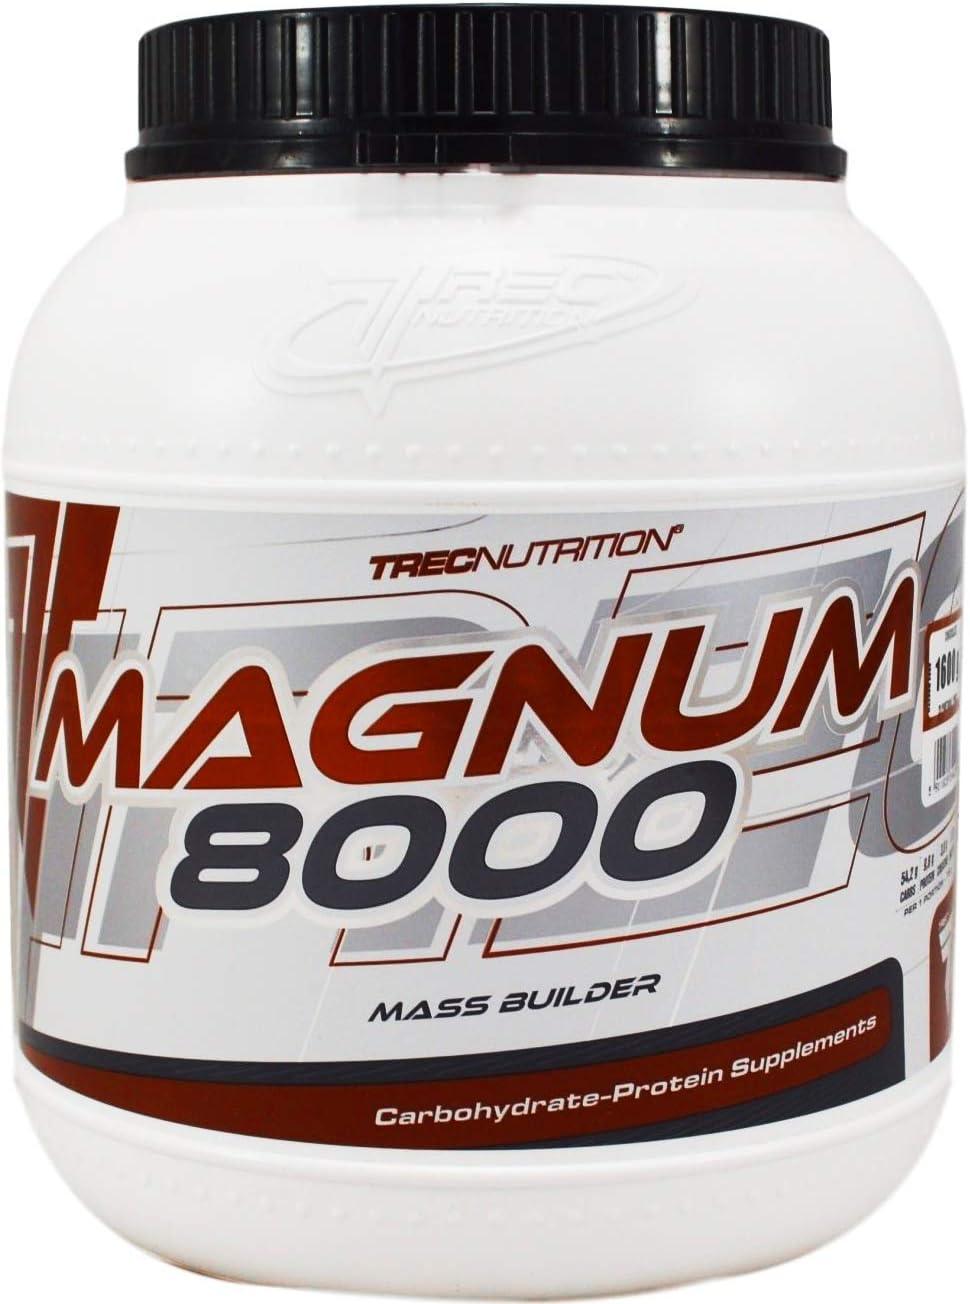 TREC Nutrición Magnum 8000 – Polvo + Creatina de Proteína de Suero Para Masa / Peso / Tamaño / Fuerza Caramelo & Vainilla